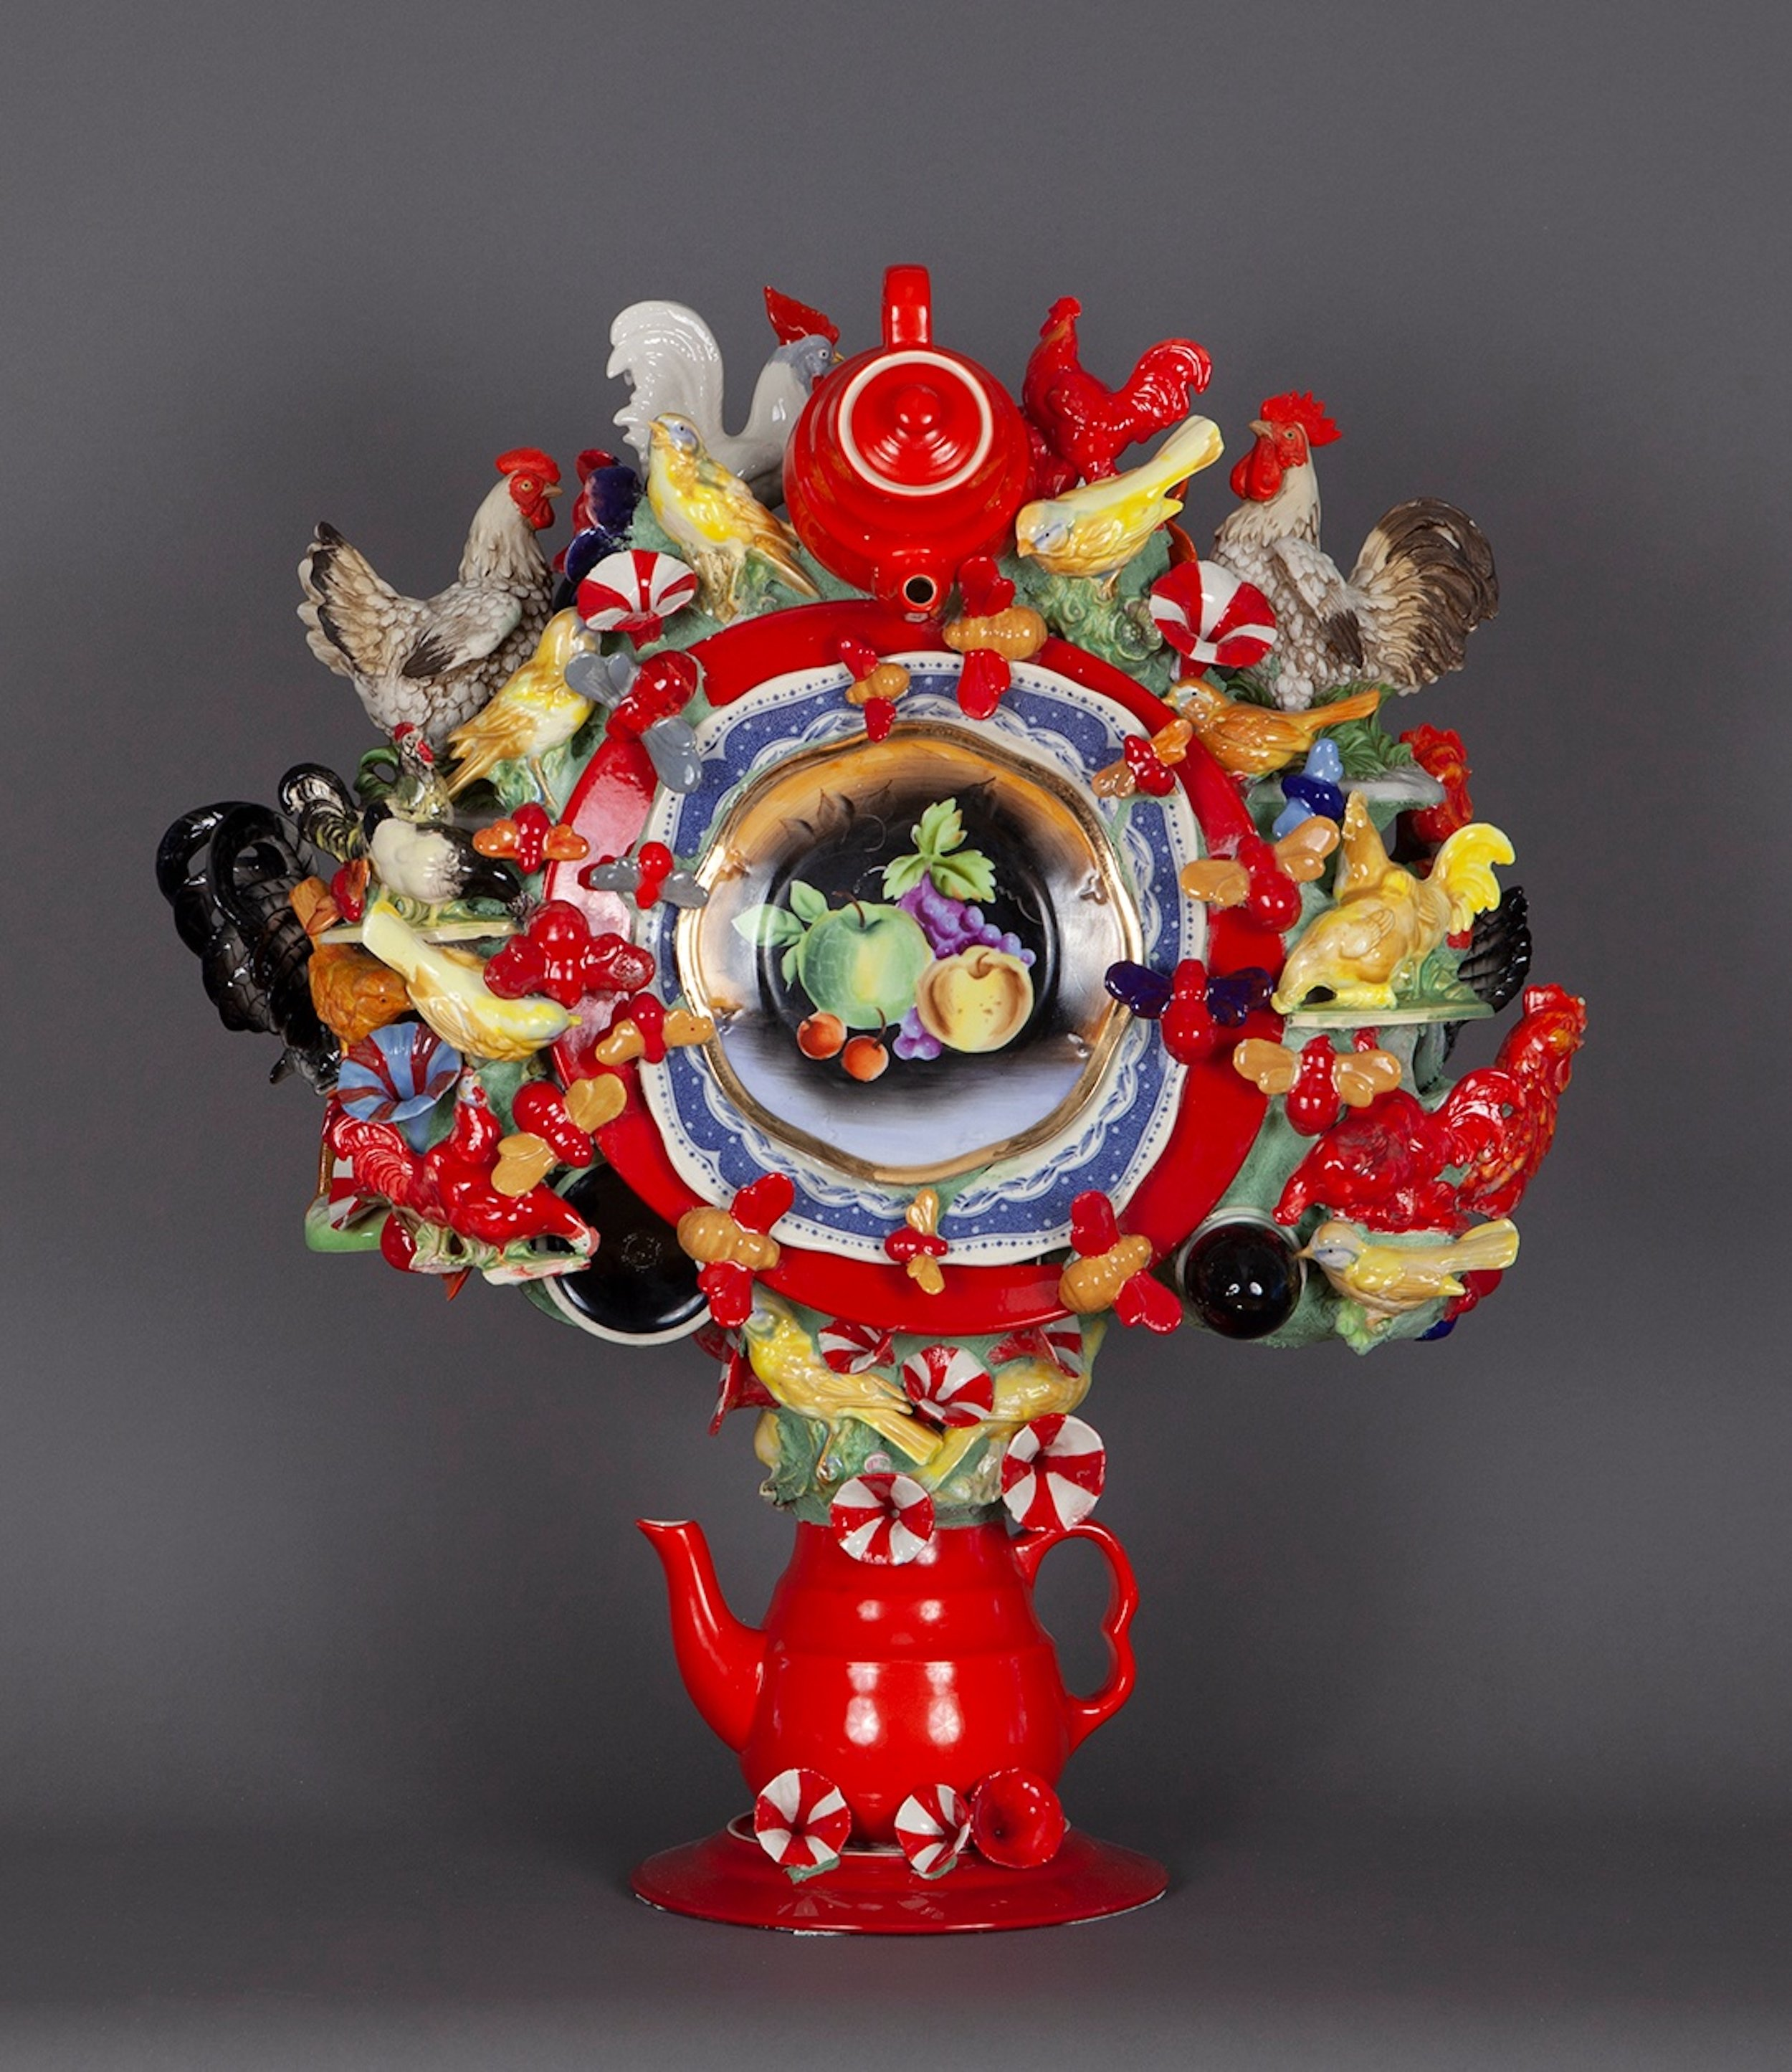 Joan Bankemper, Red Delicious, 2019 ceramic 25 x 22 x 12 inches